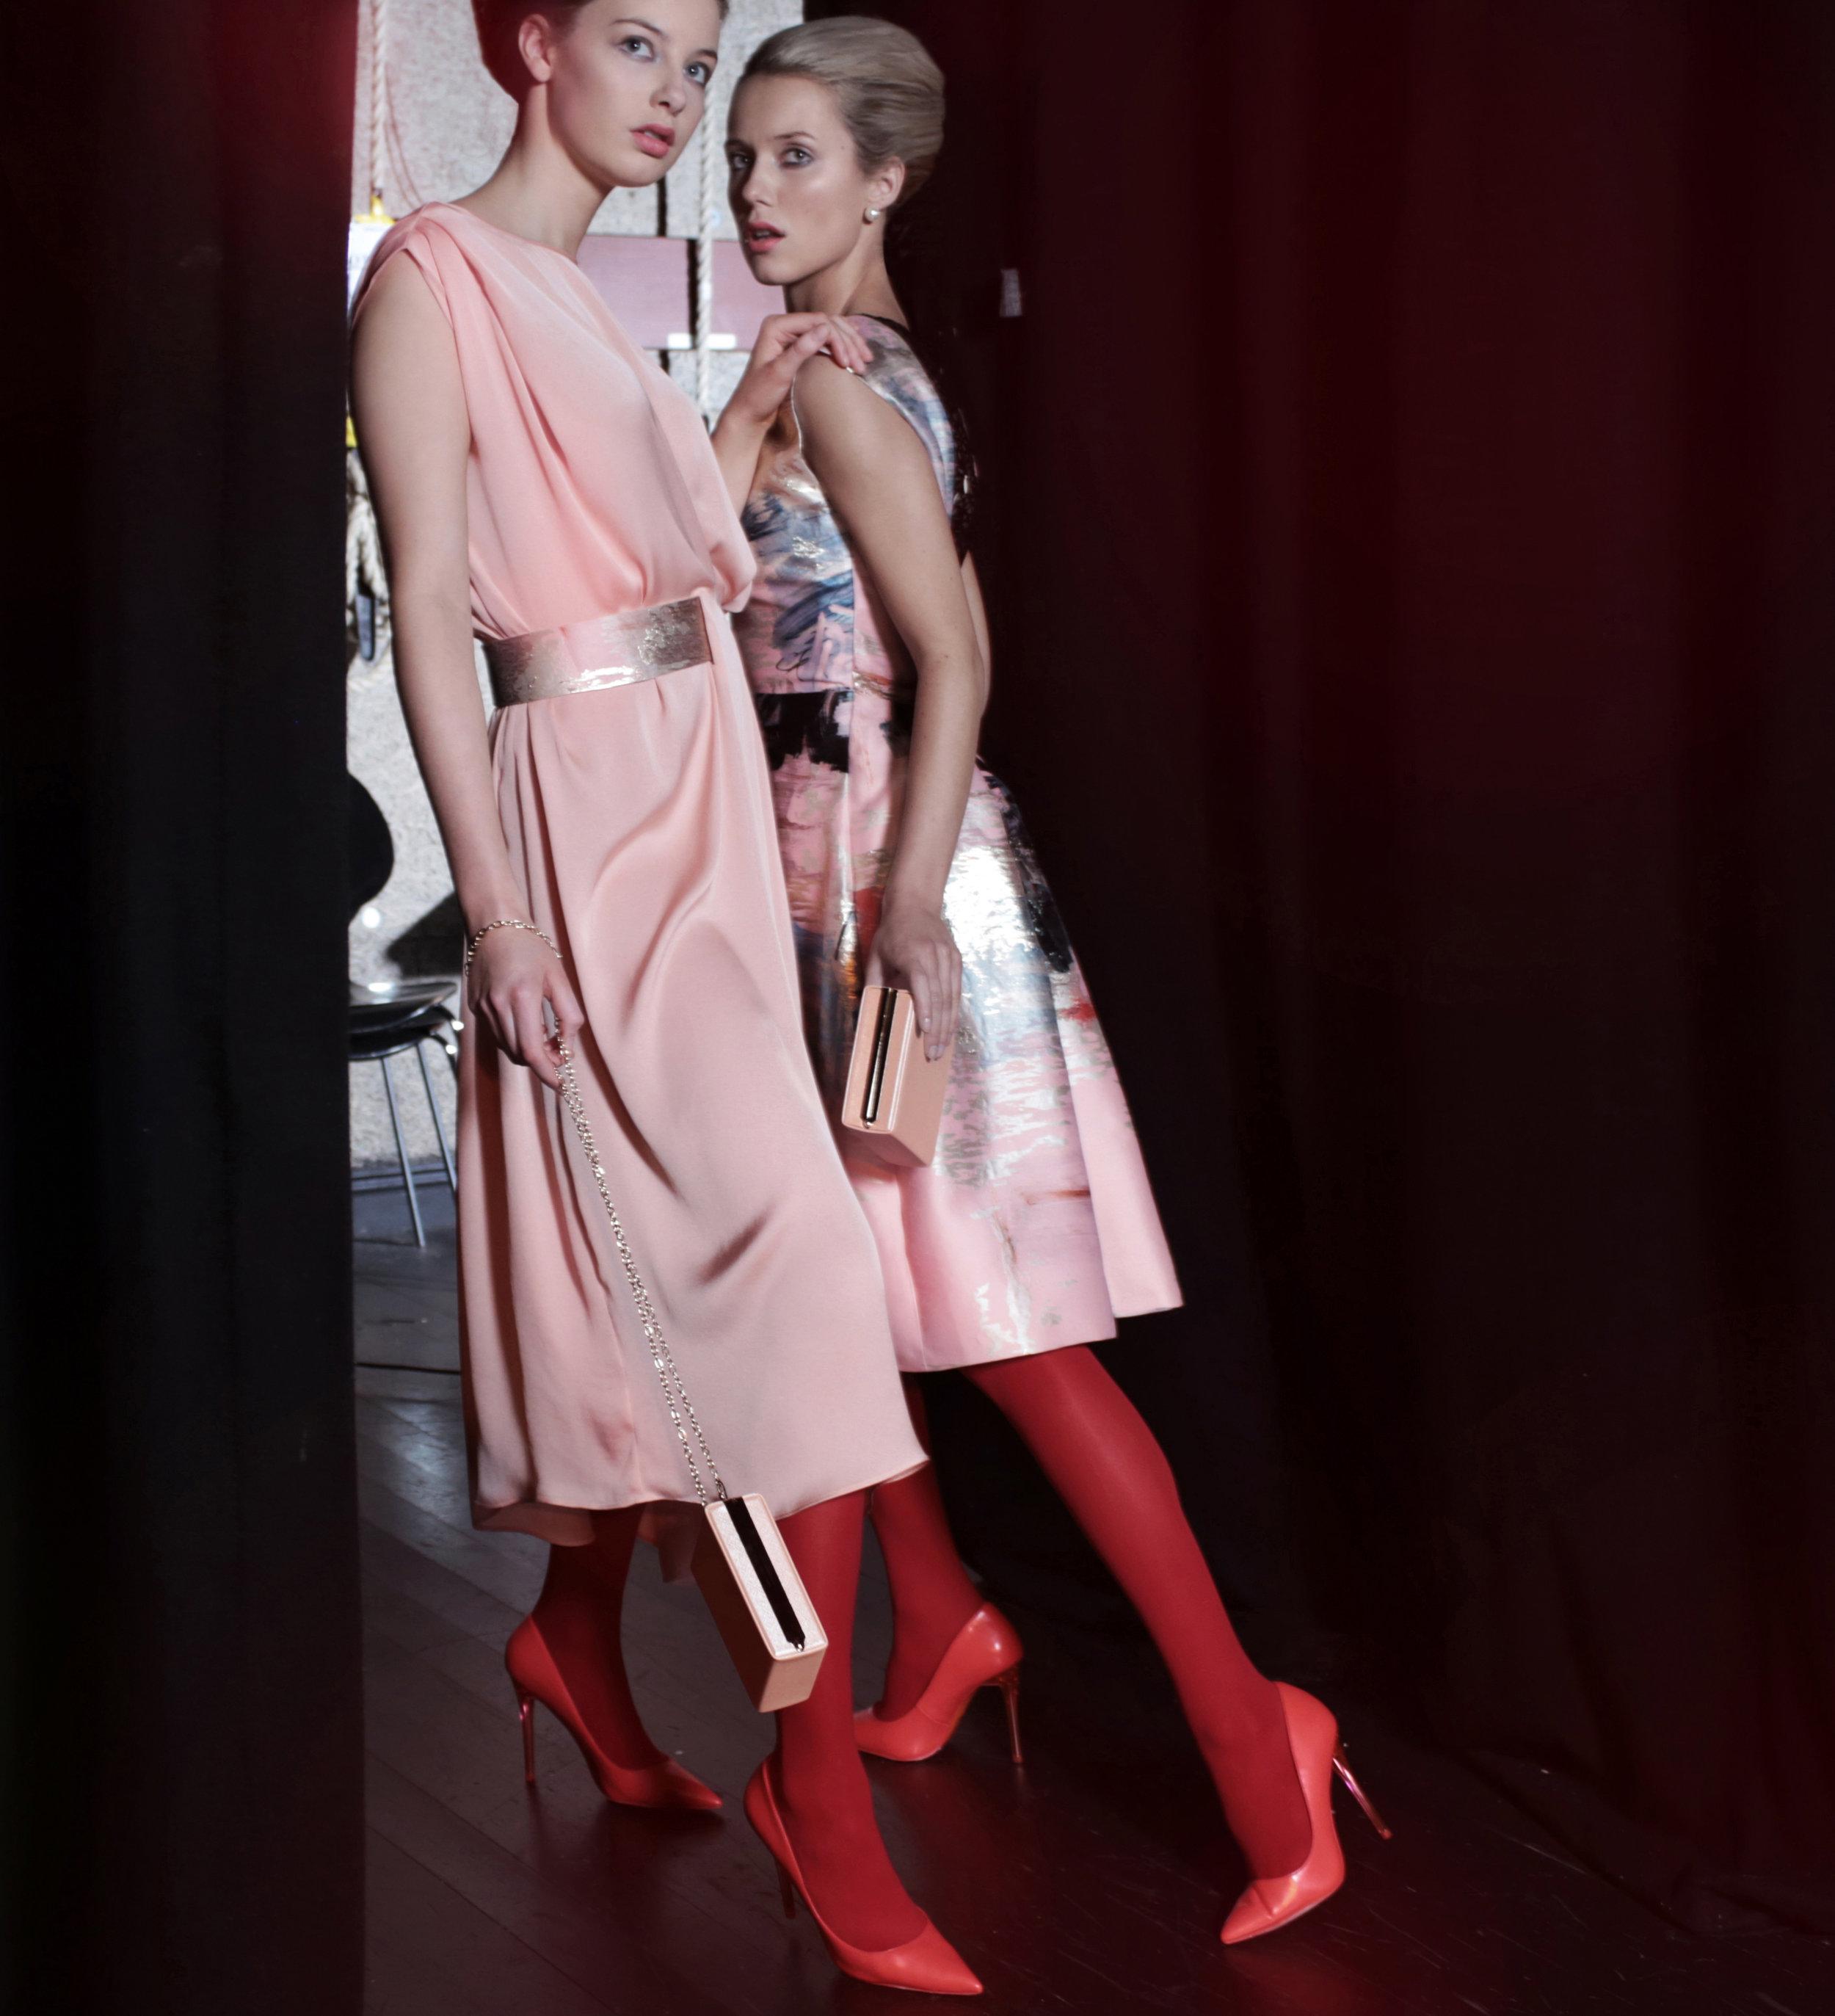 2. Scarlett blush dress & Twiggy abstract print dress.jpg